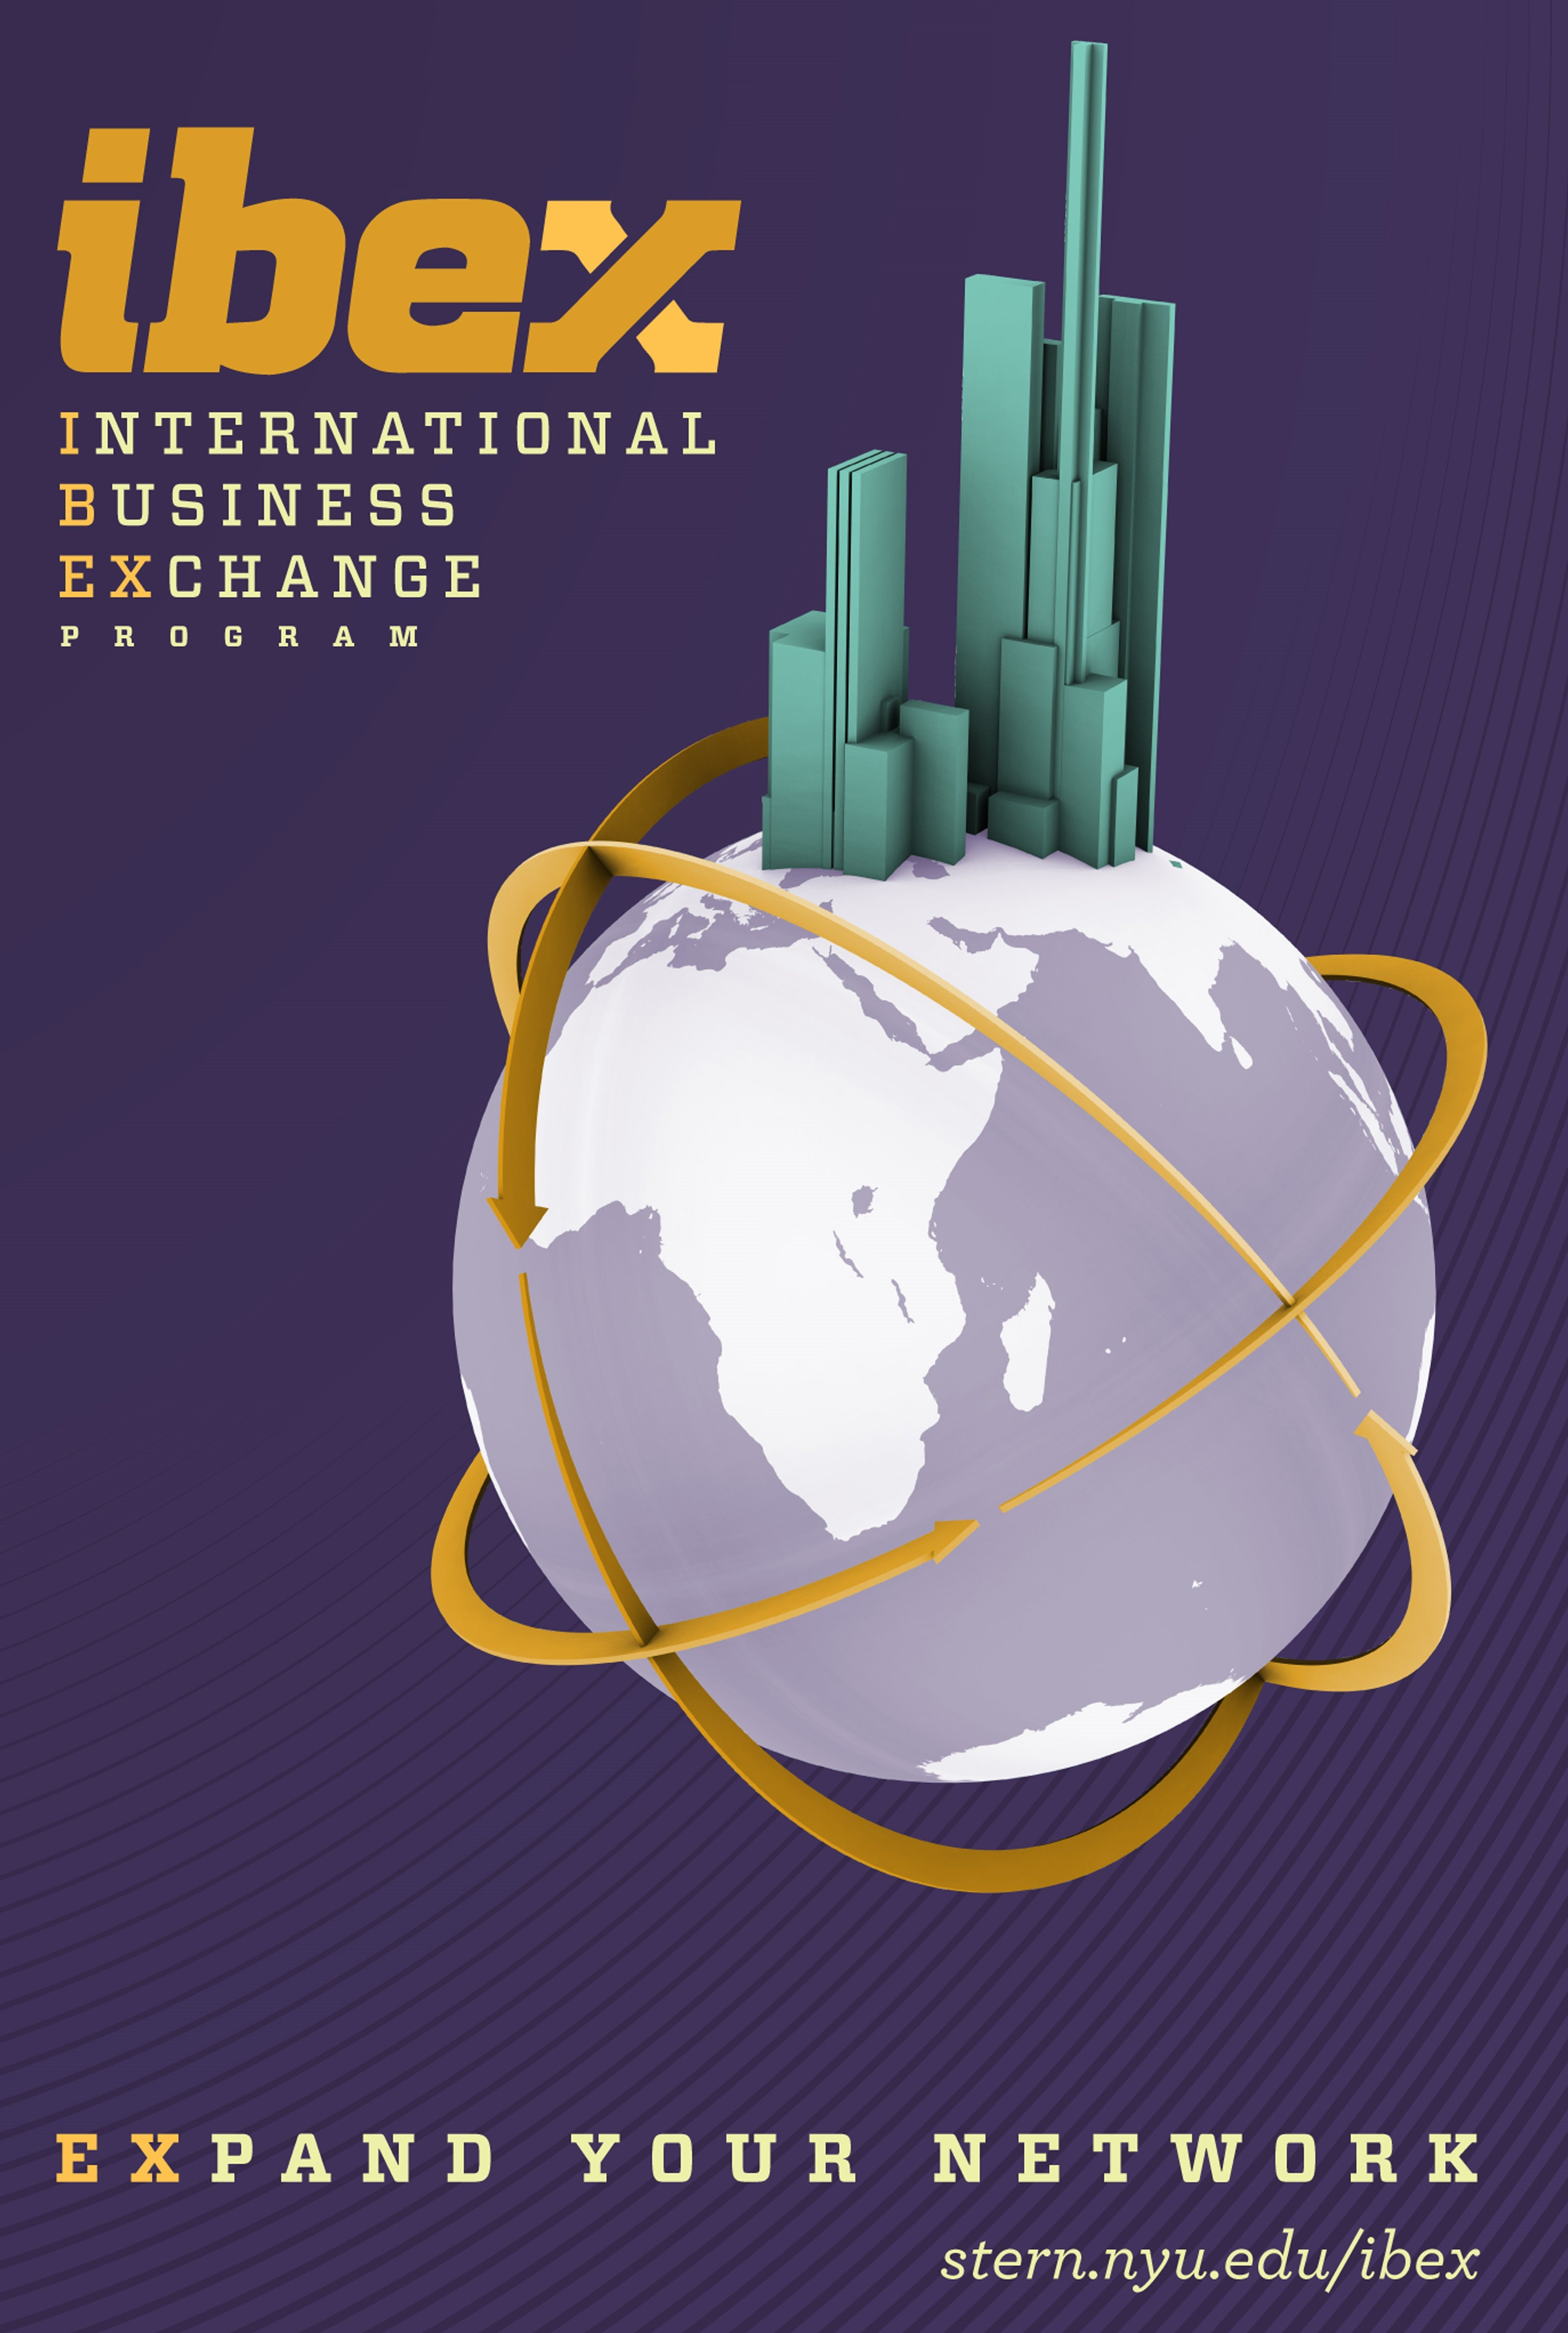 IBEX Poster